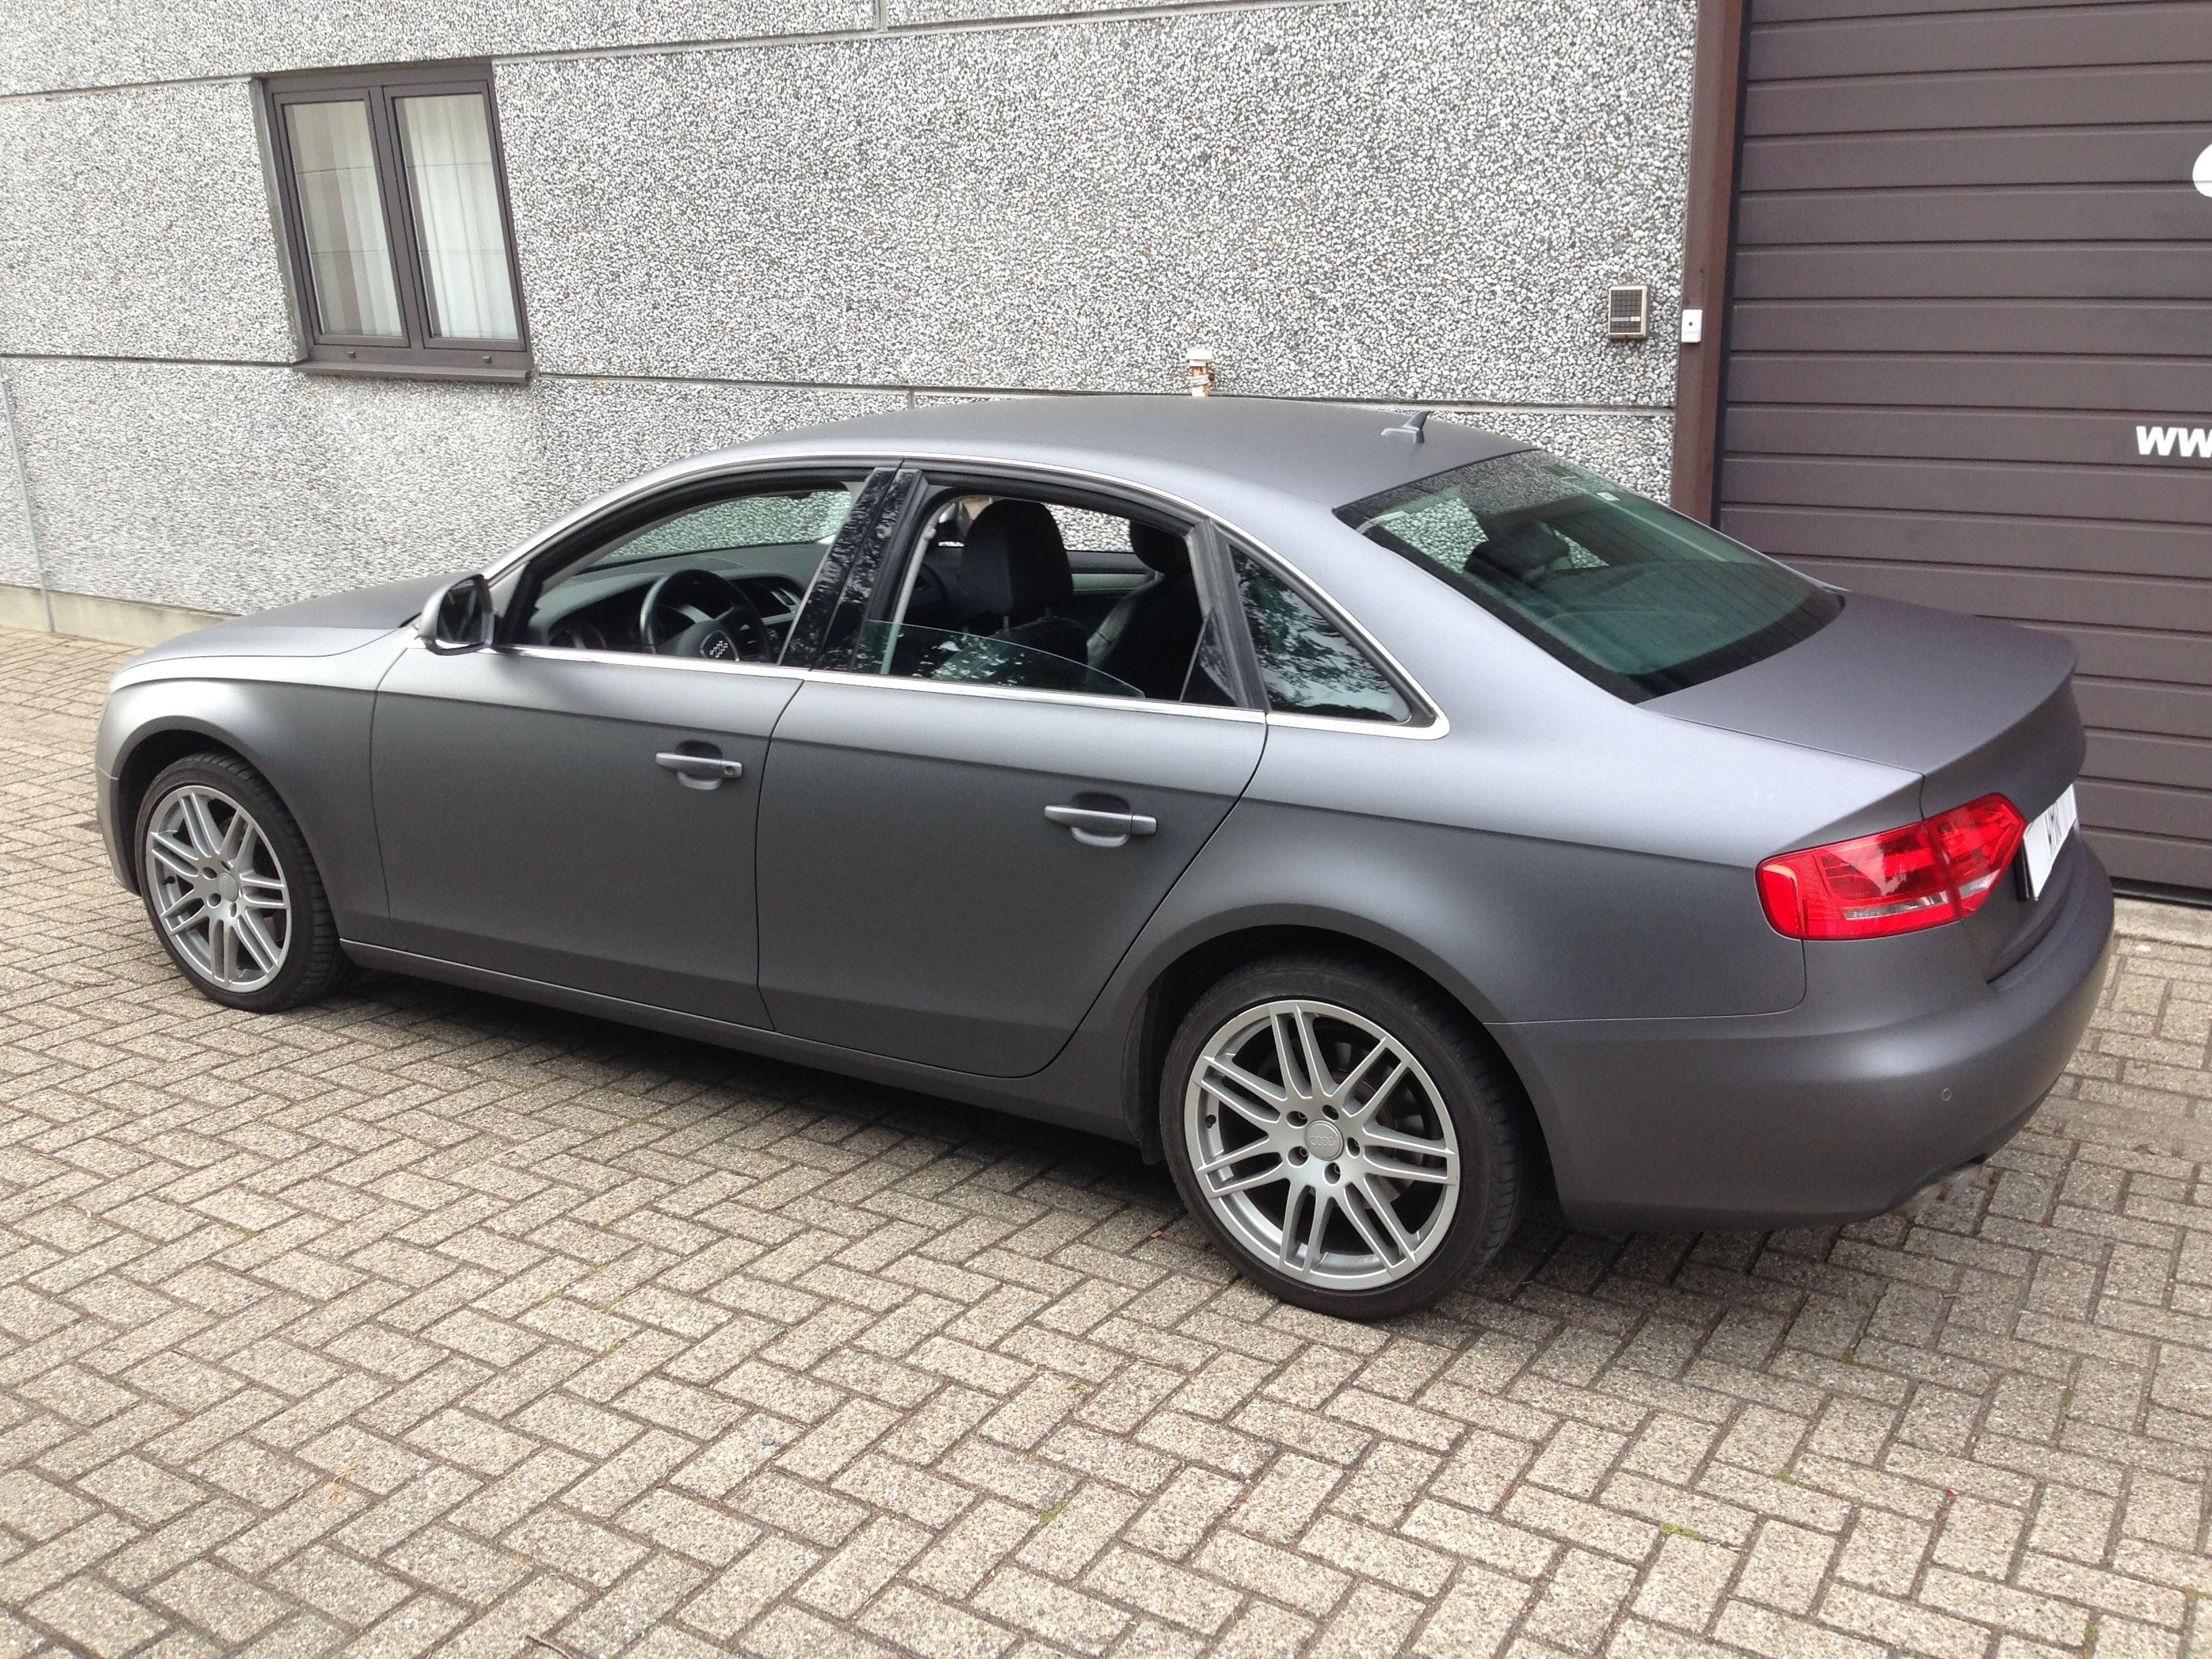 Audi A4 B6 met Gunpowder Wrap, Carwrapping door Wrapmyride.nu Foto-nr:4507, ©2021